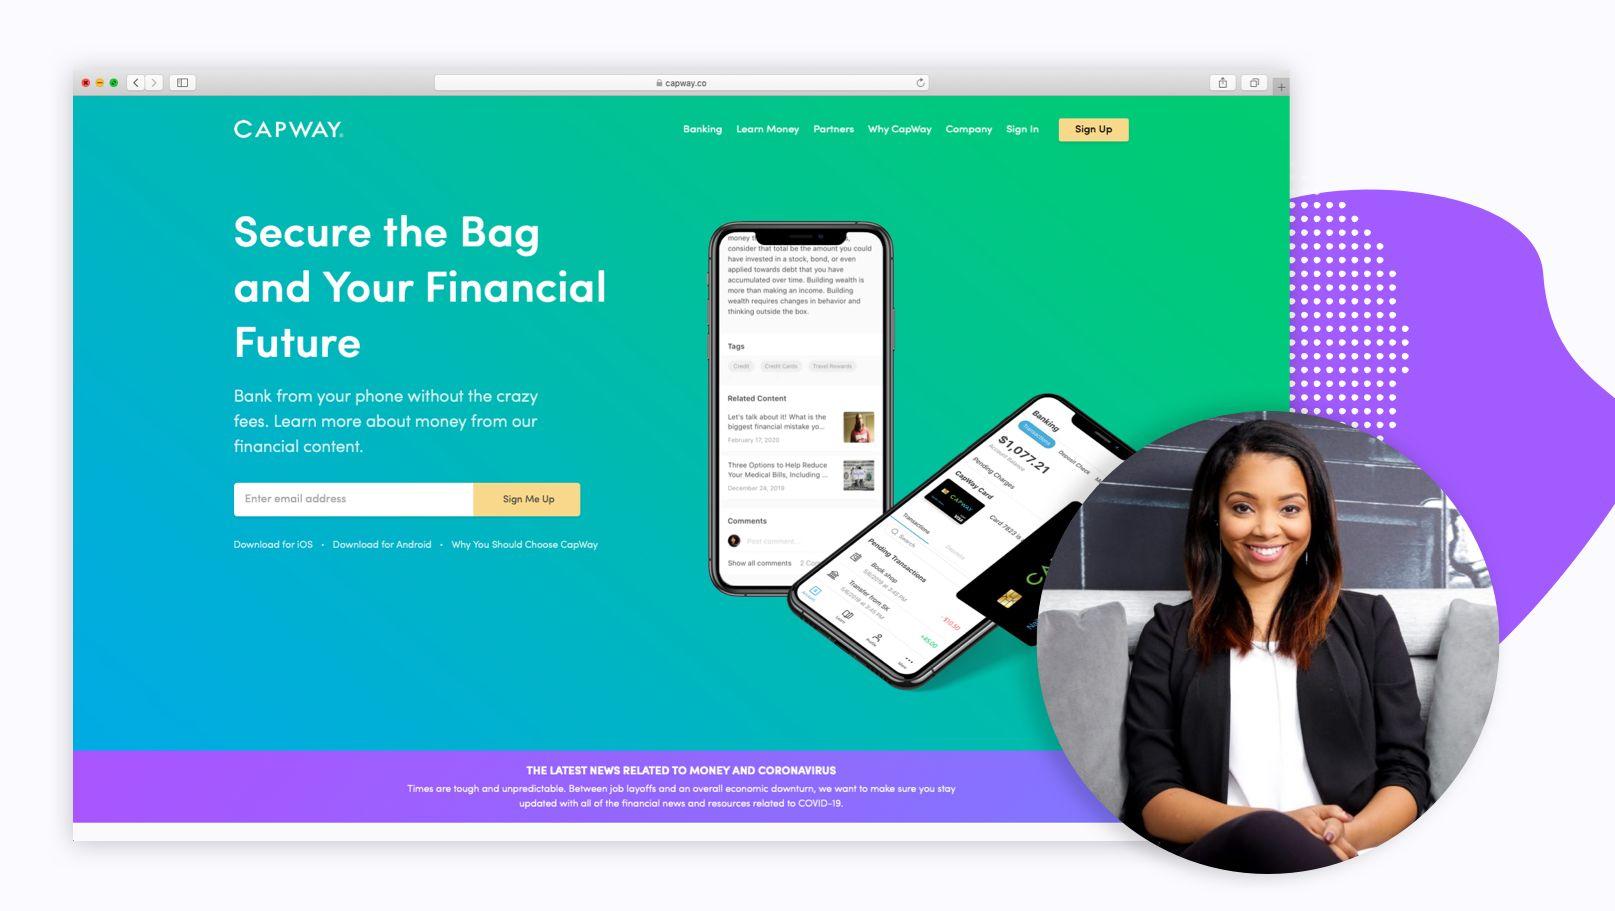 Capwap bank from your phone app screenshot